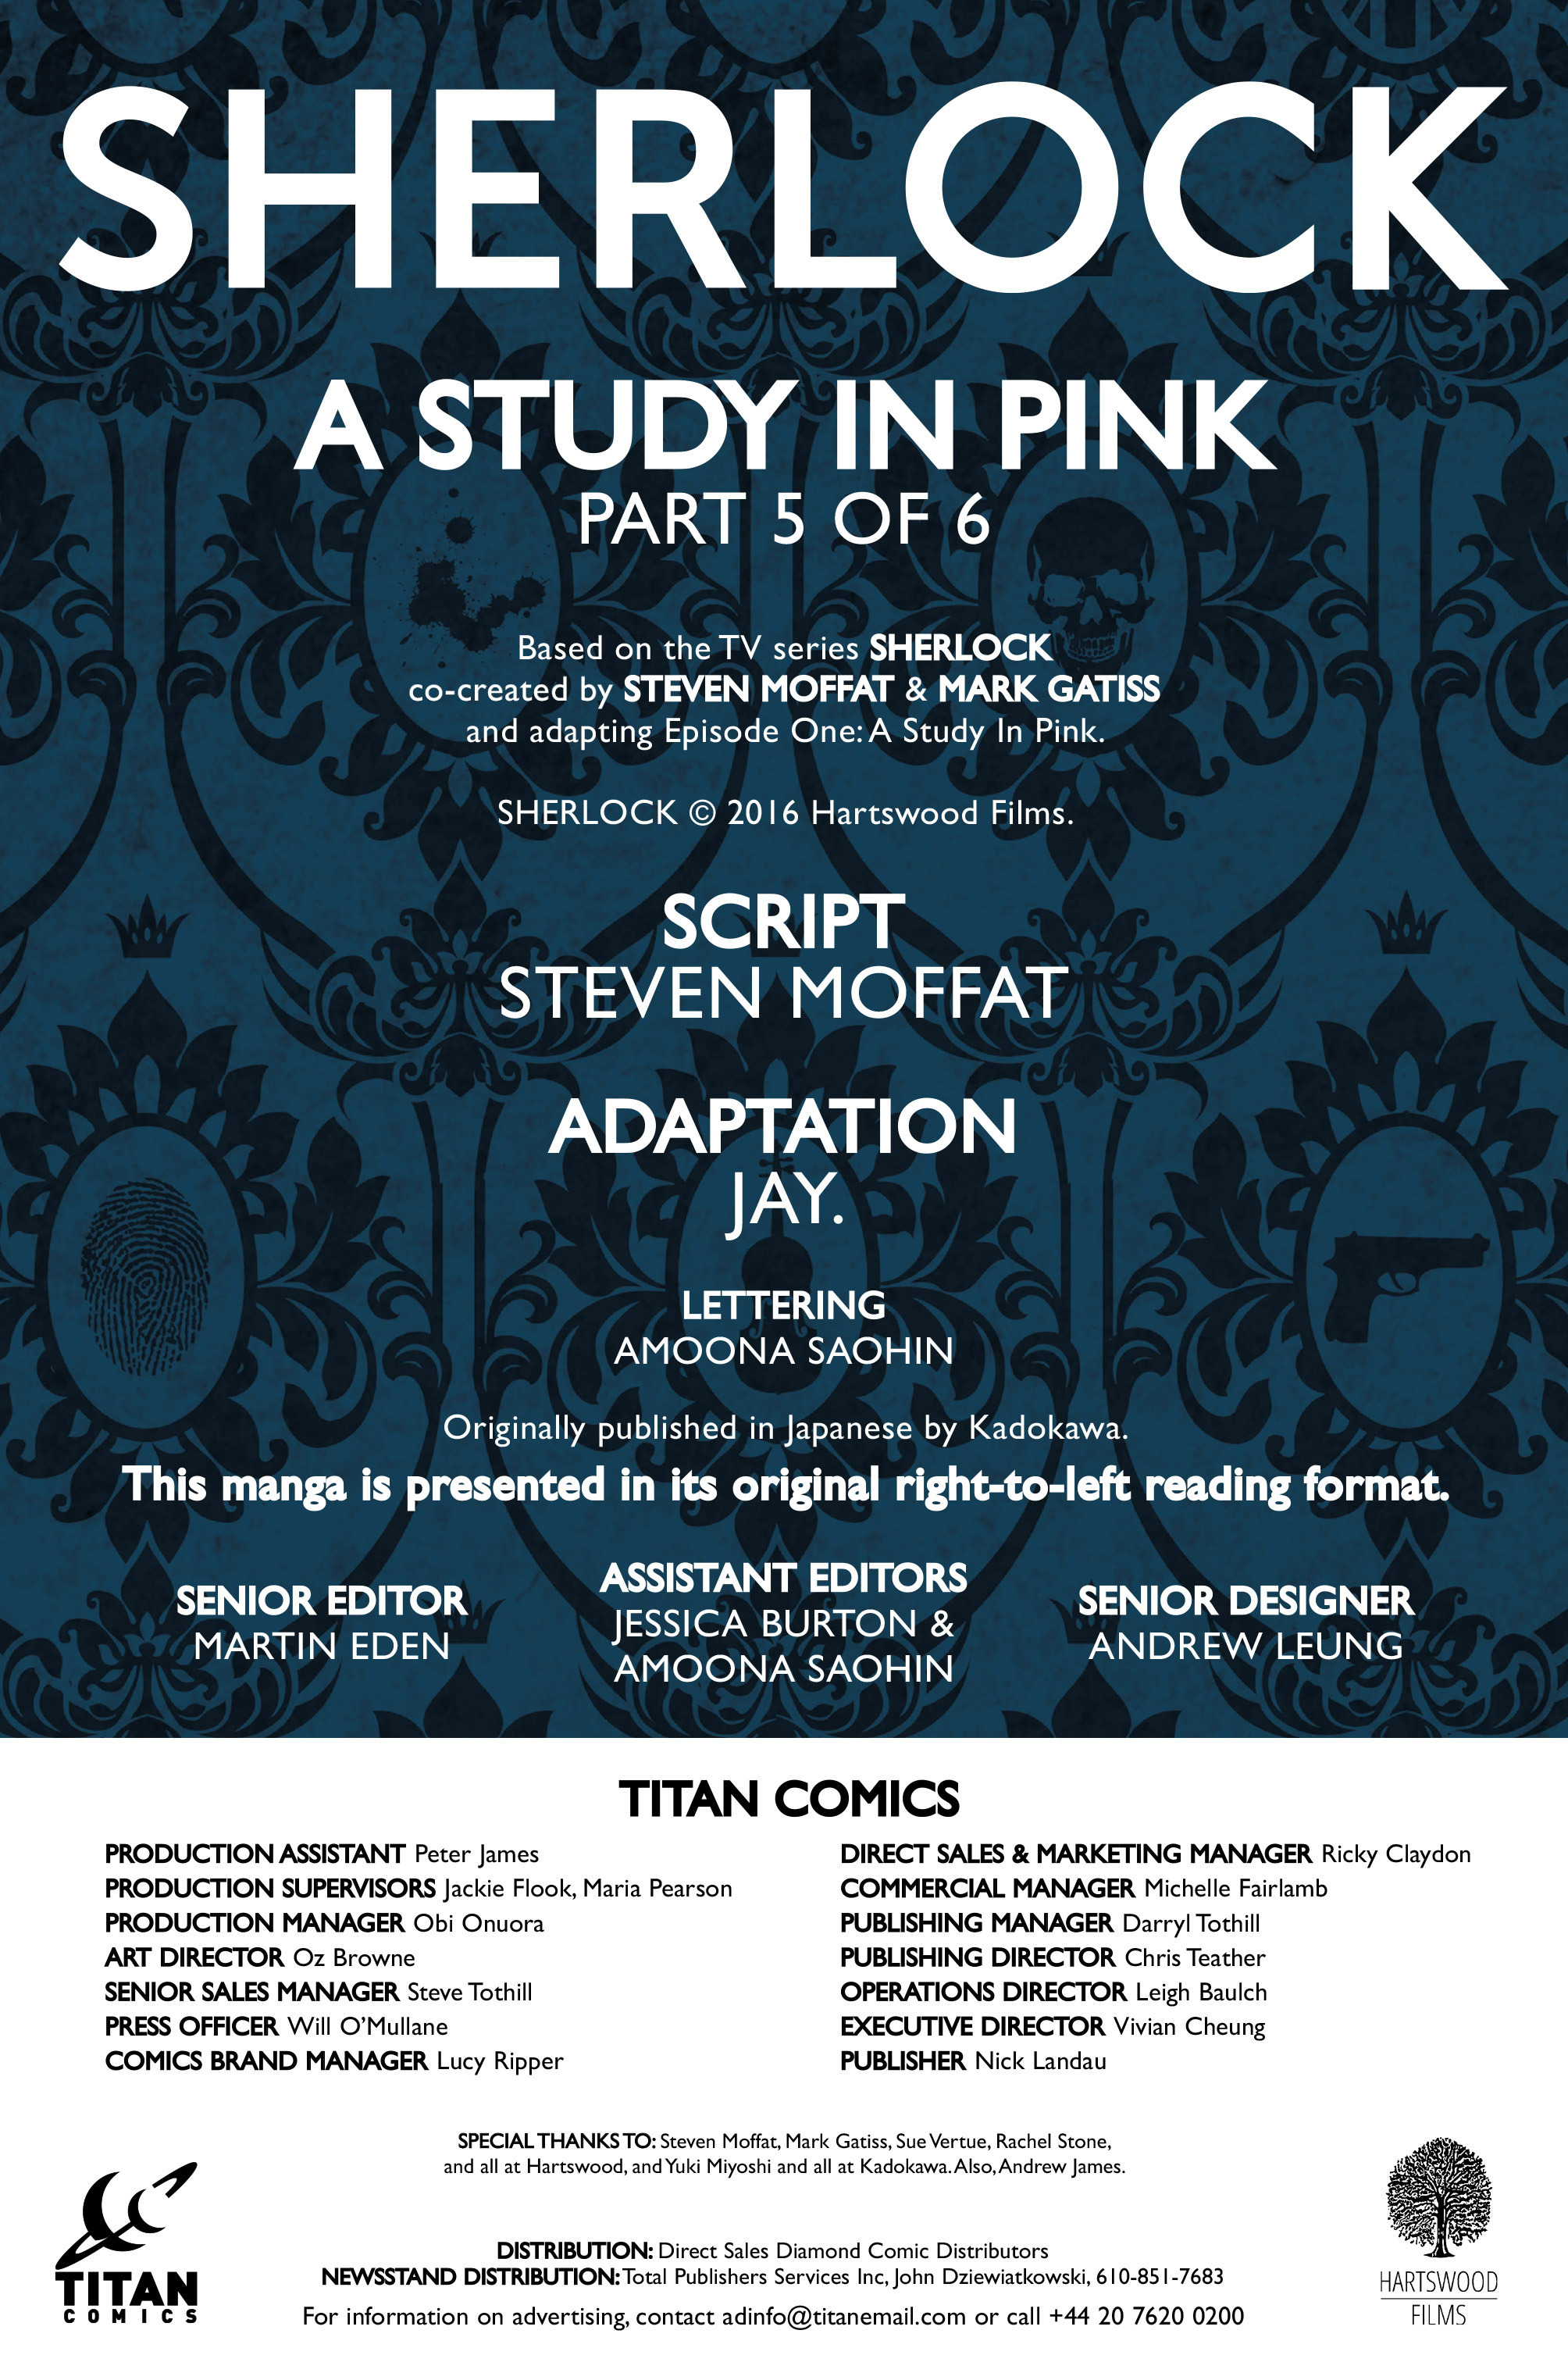 Read online Sherlock: A Study In Pink comic -  Issue #5 - 4